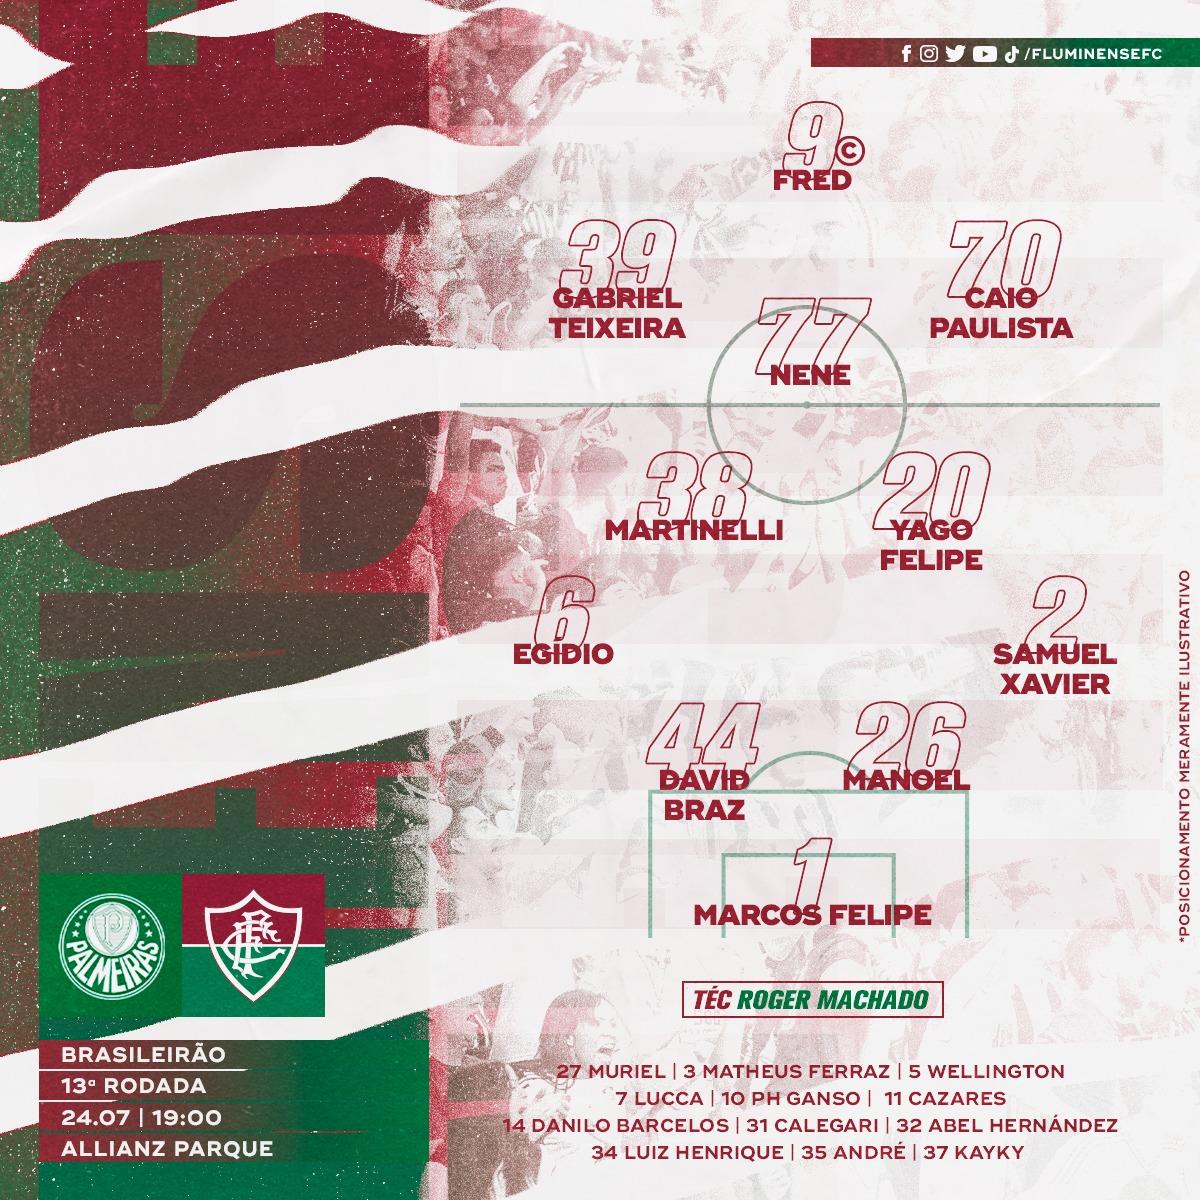 Fluminense escalado para pegar o Palmeiras pela Série A